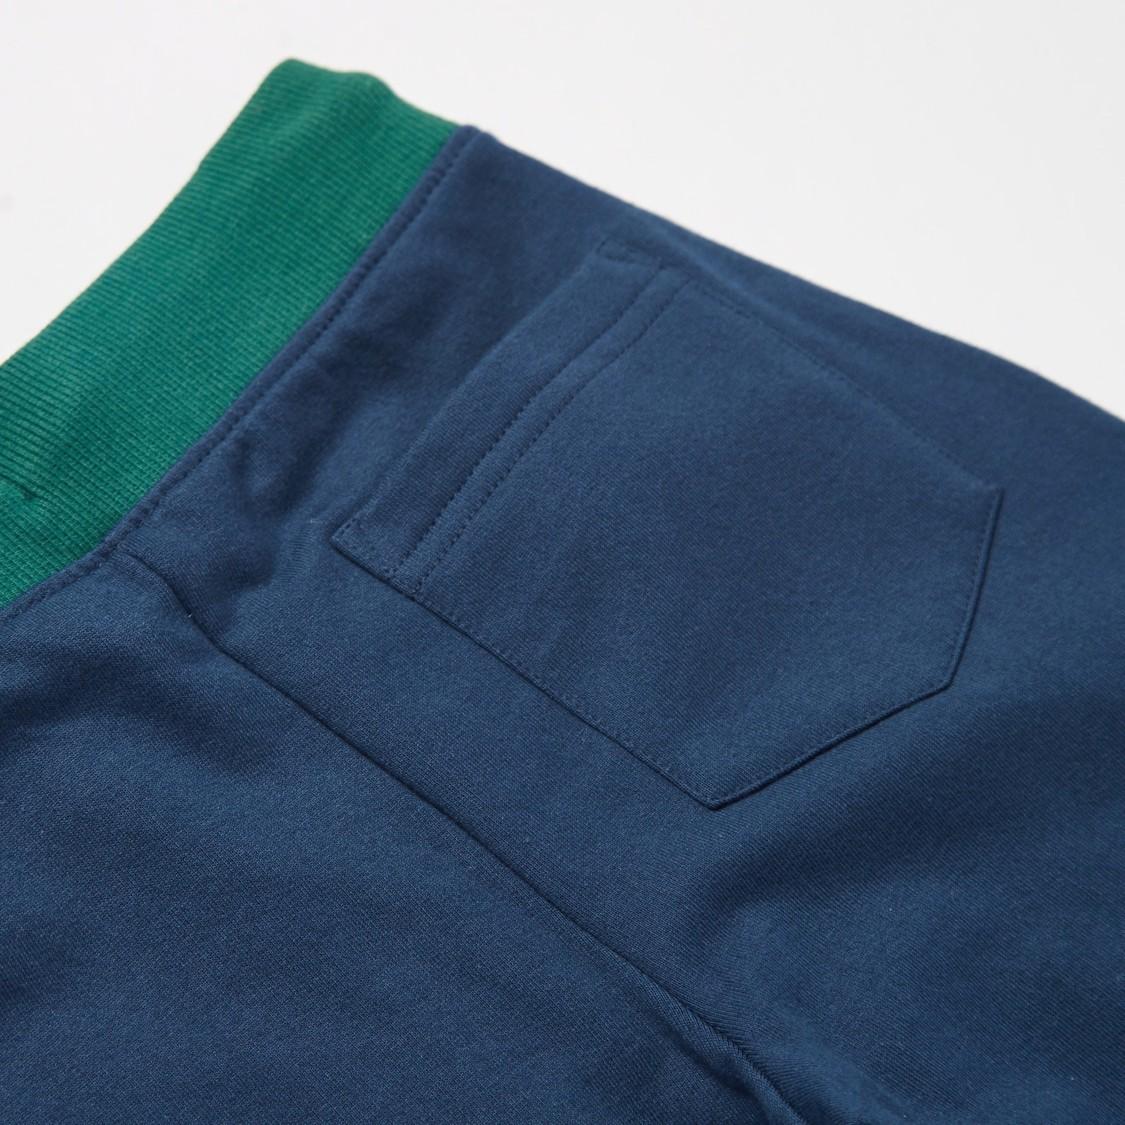 Graphic Print Long Sleeves Sweatshirt with Full Length Jog Pants